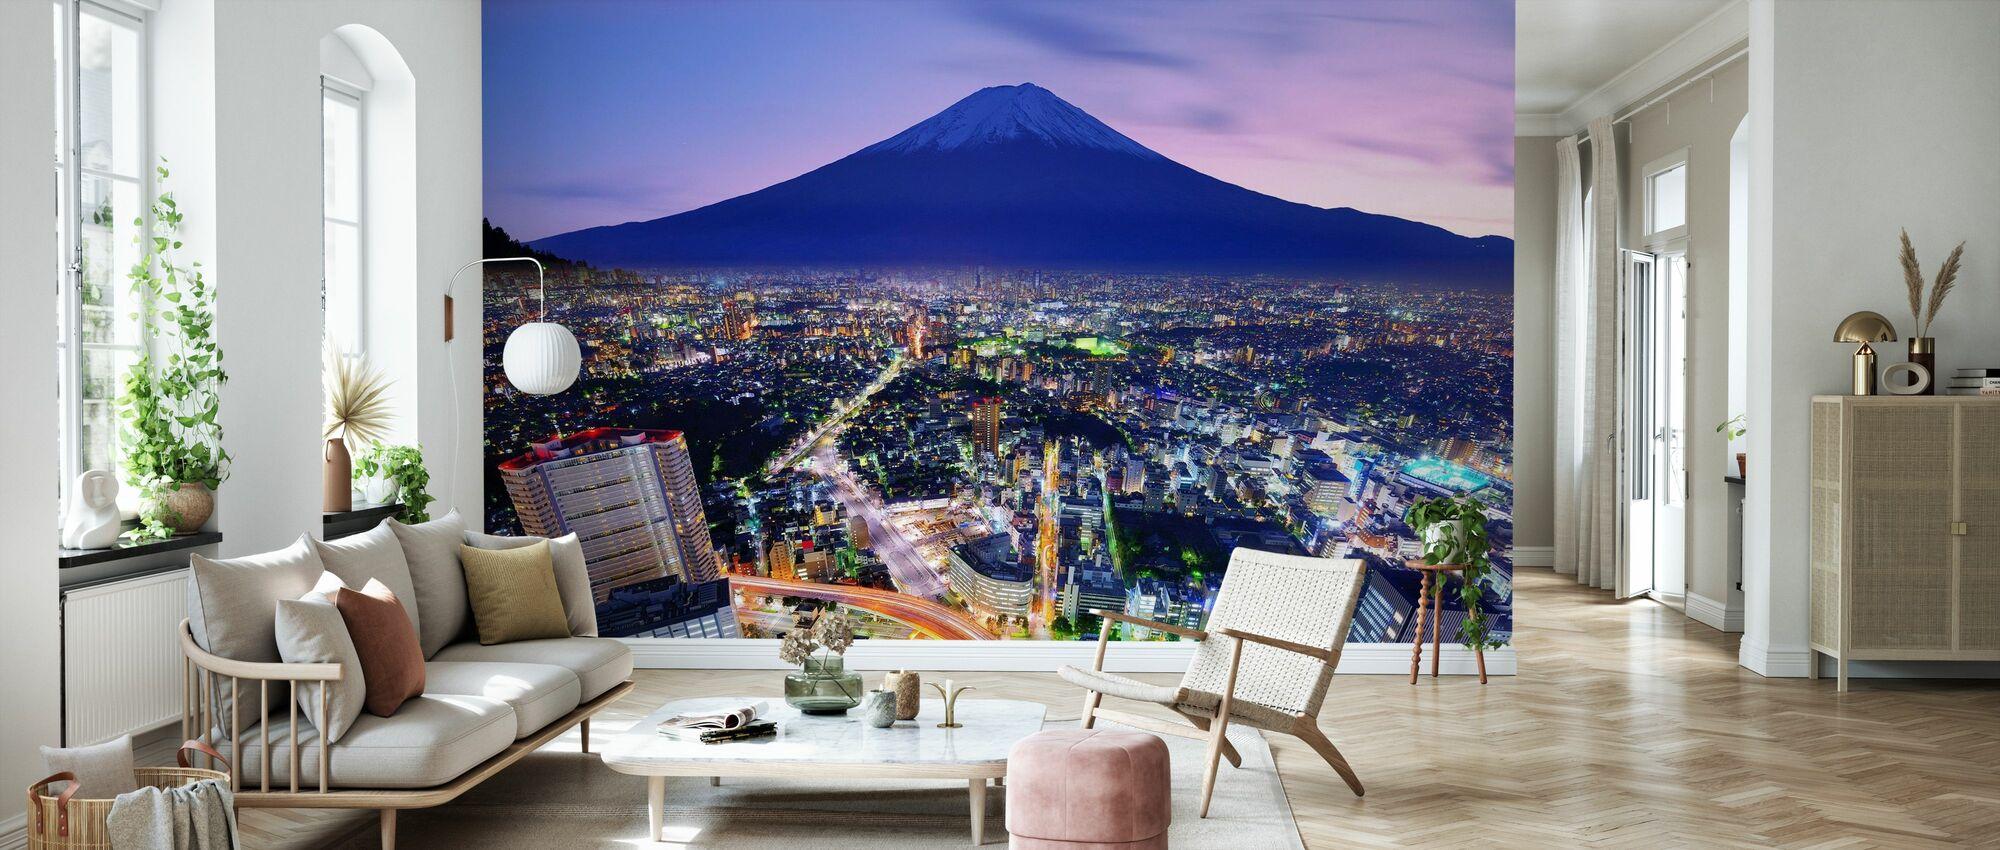 Ueno District and Mt. Fuji in Tokyo, Japan - Wallpaper - Living Room